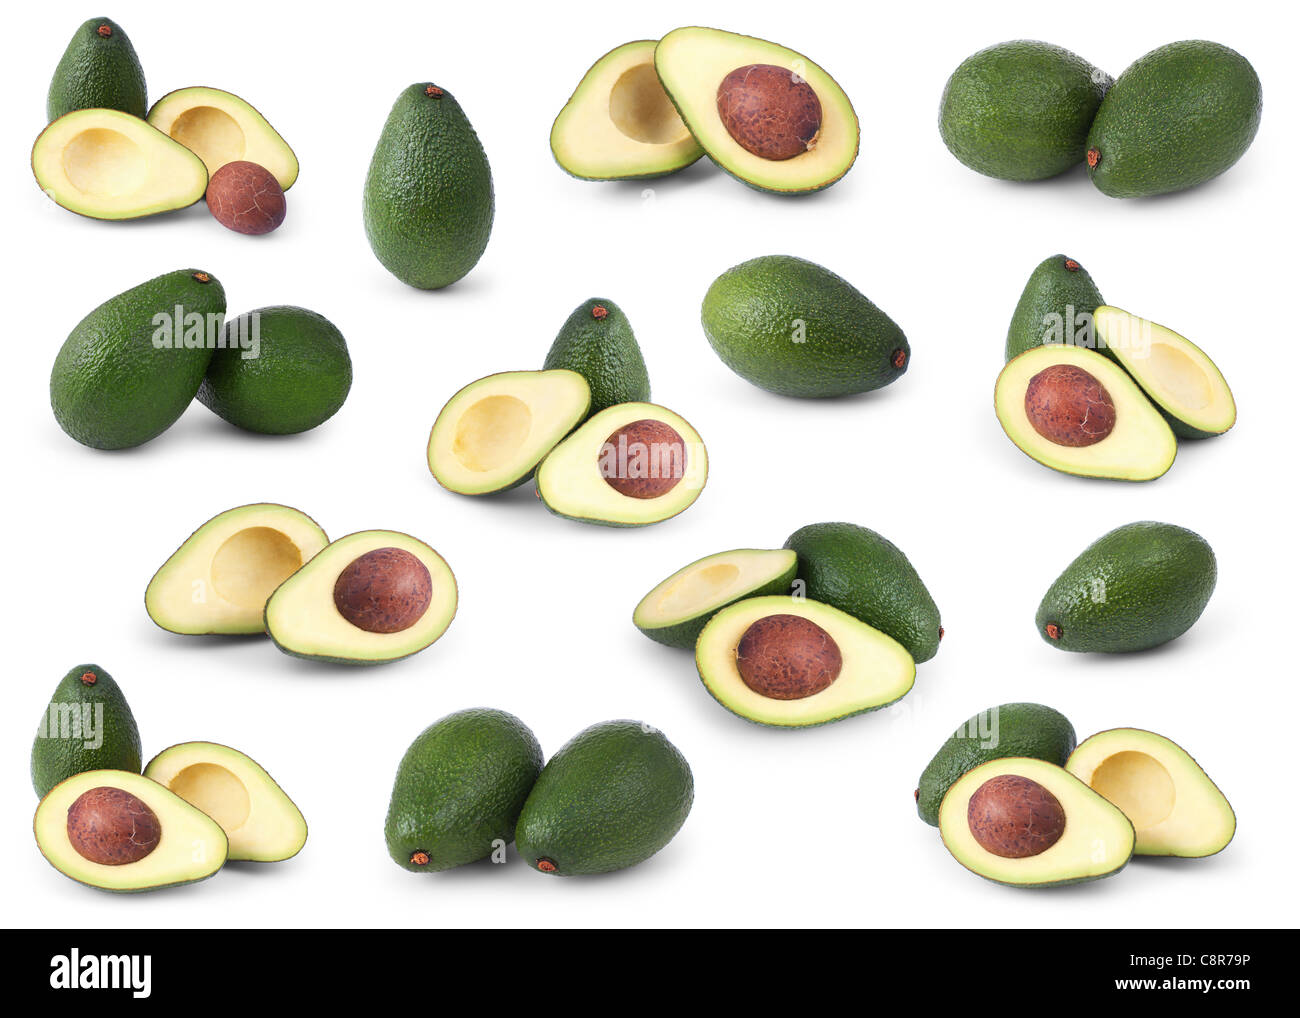 Set of avocados isolated over white background - Stock Image